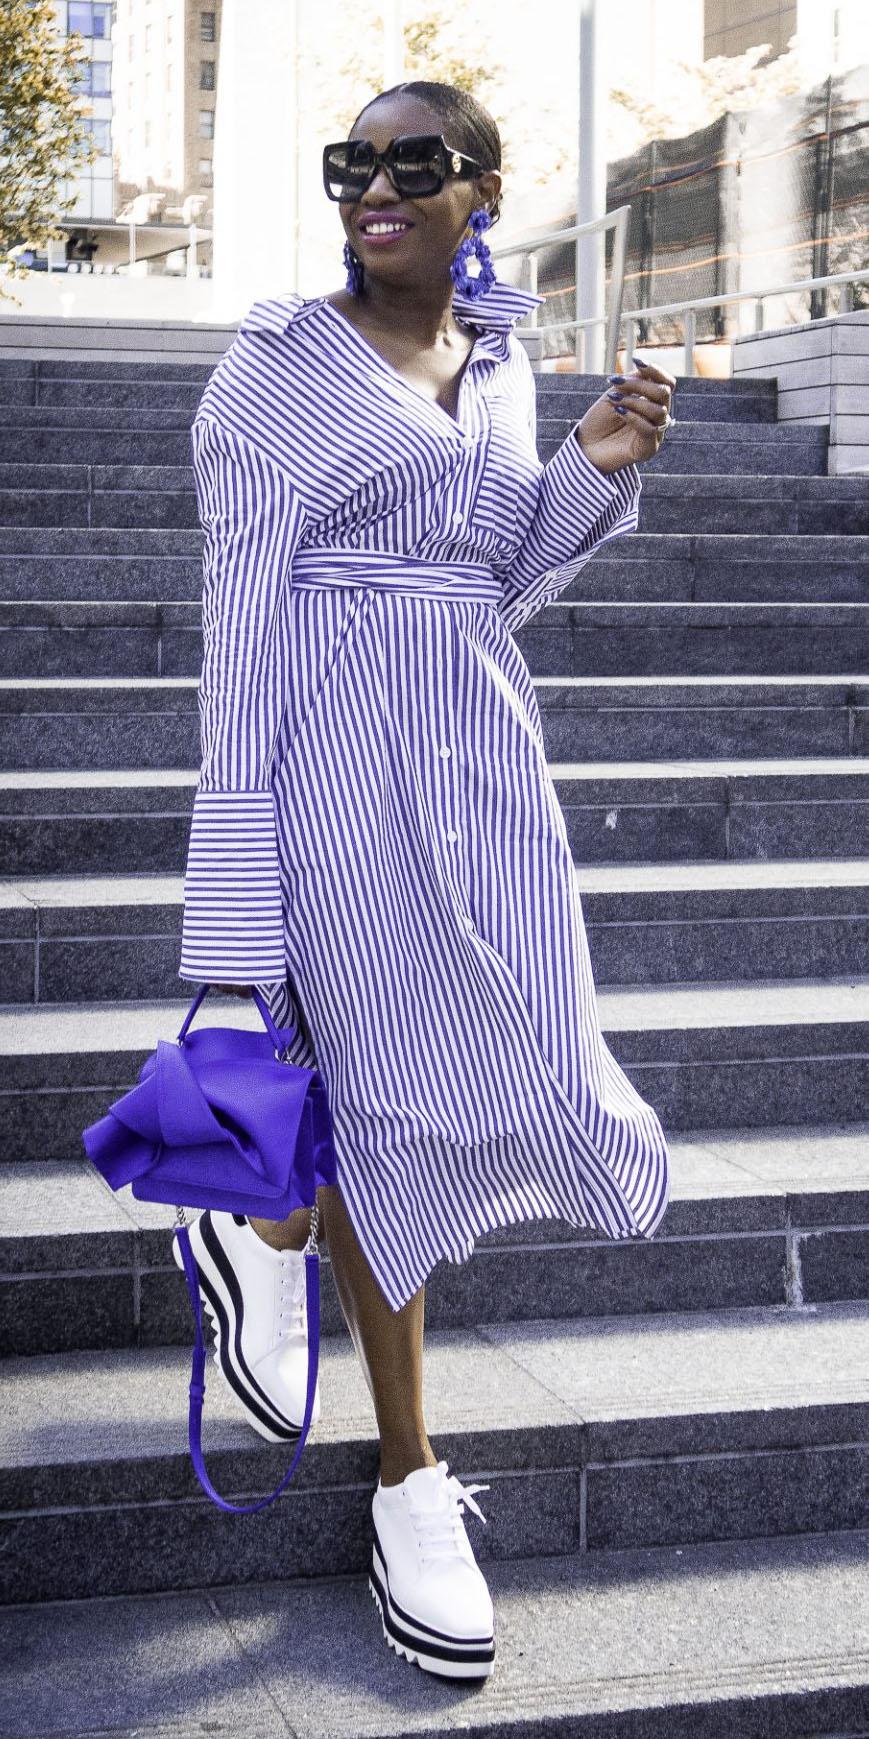 purple-royal-dress-shirt-midi-pinstripe-earrings-purple-bag-white-shoe-brogues-bun-brun-spring-summer-lunch.jpg